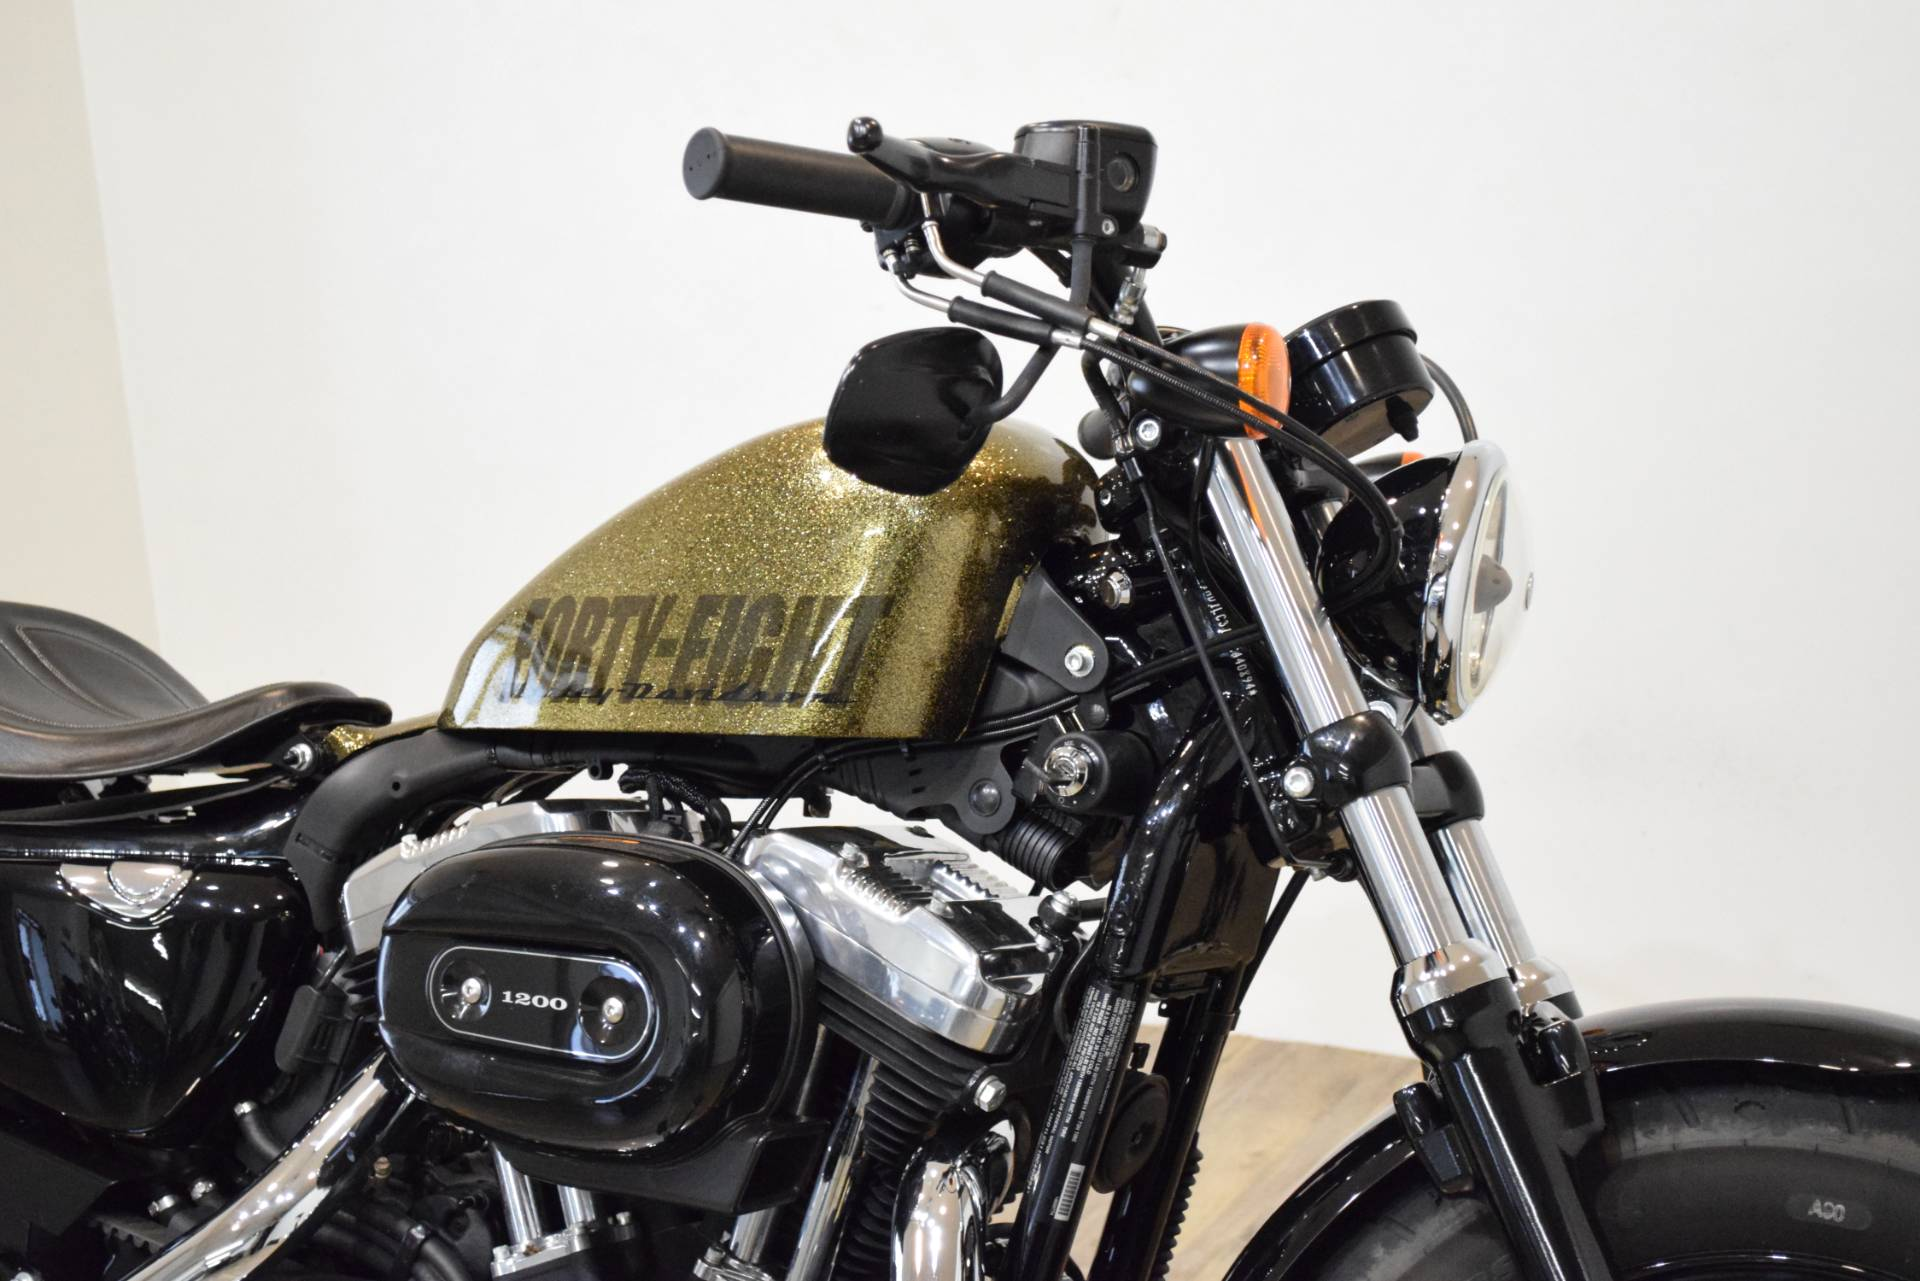 2013 Harley-Davidson Sportster Forty-Eight 3